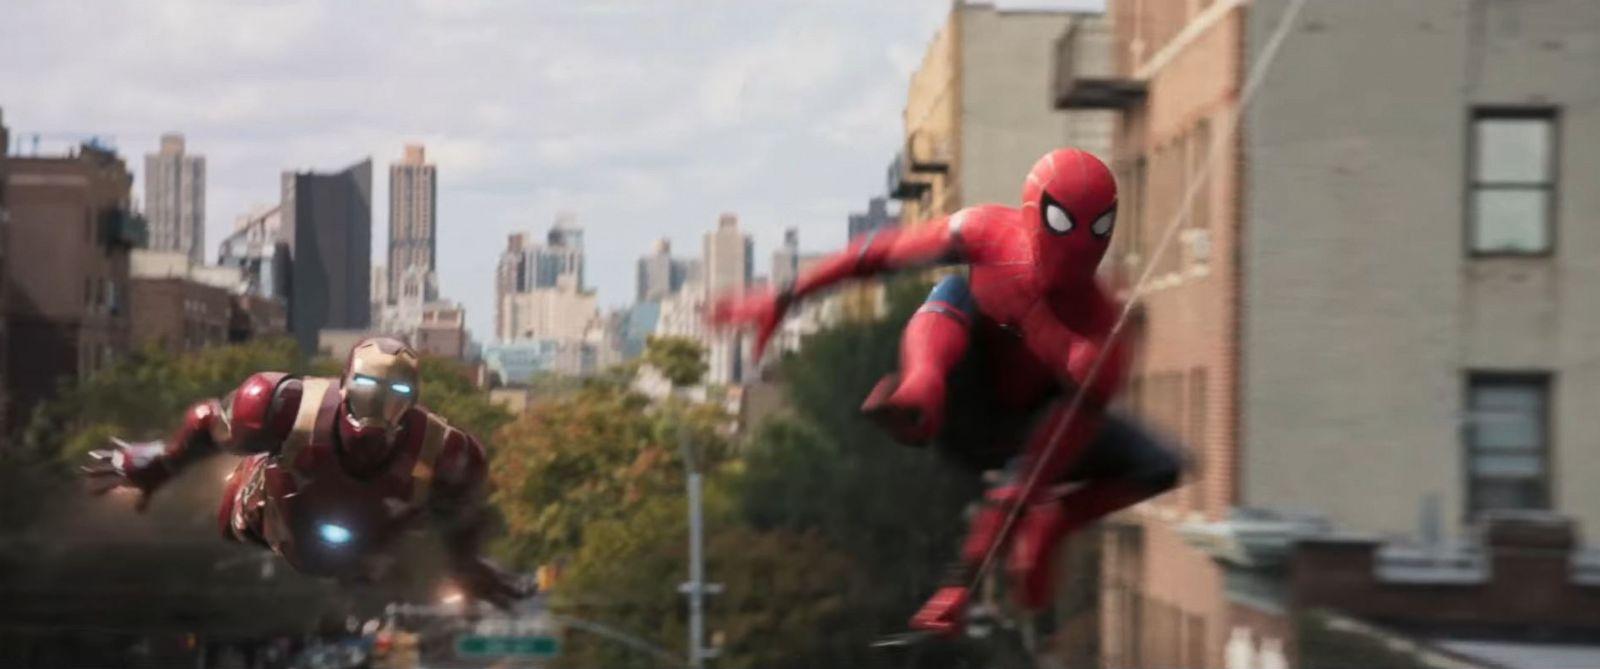 Spider-Man Homecoming Trailer Reaction – Underwhelming